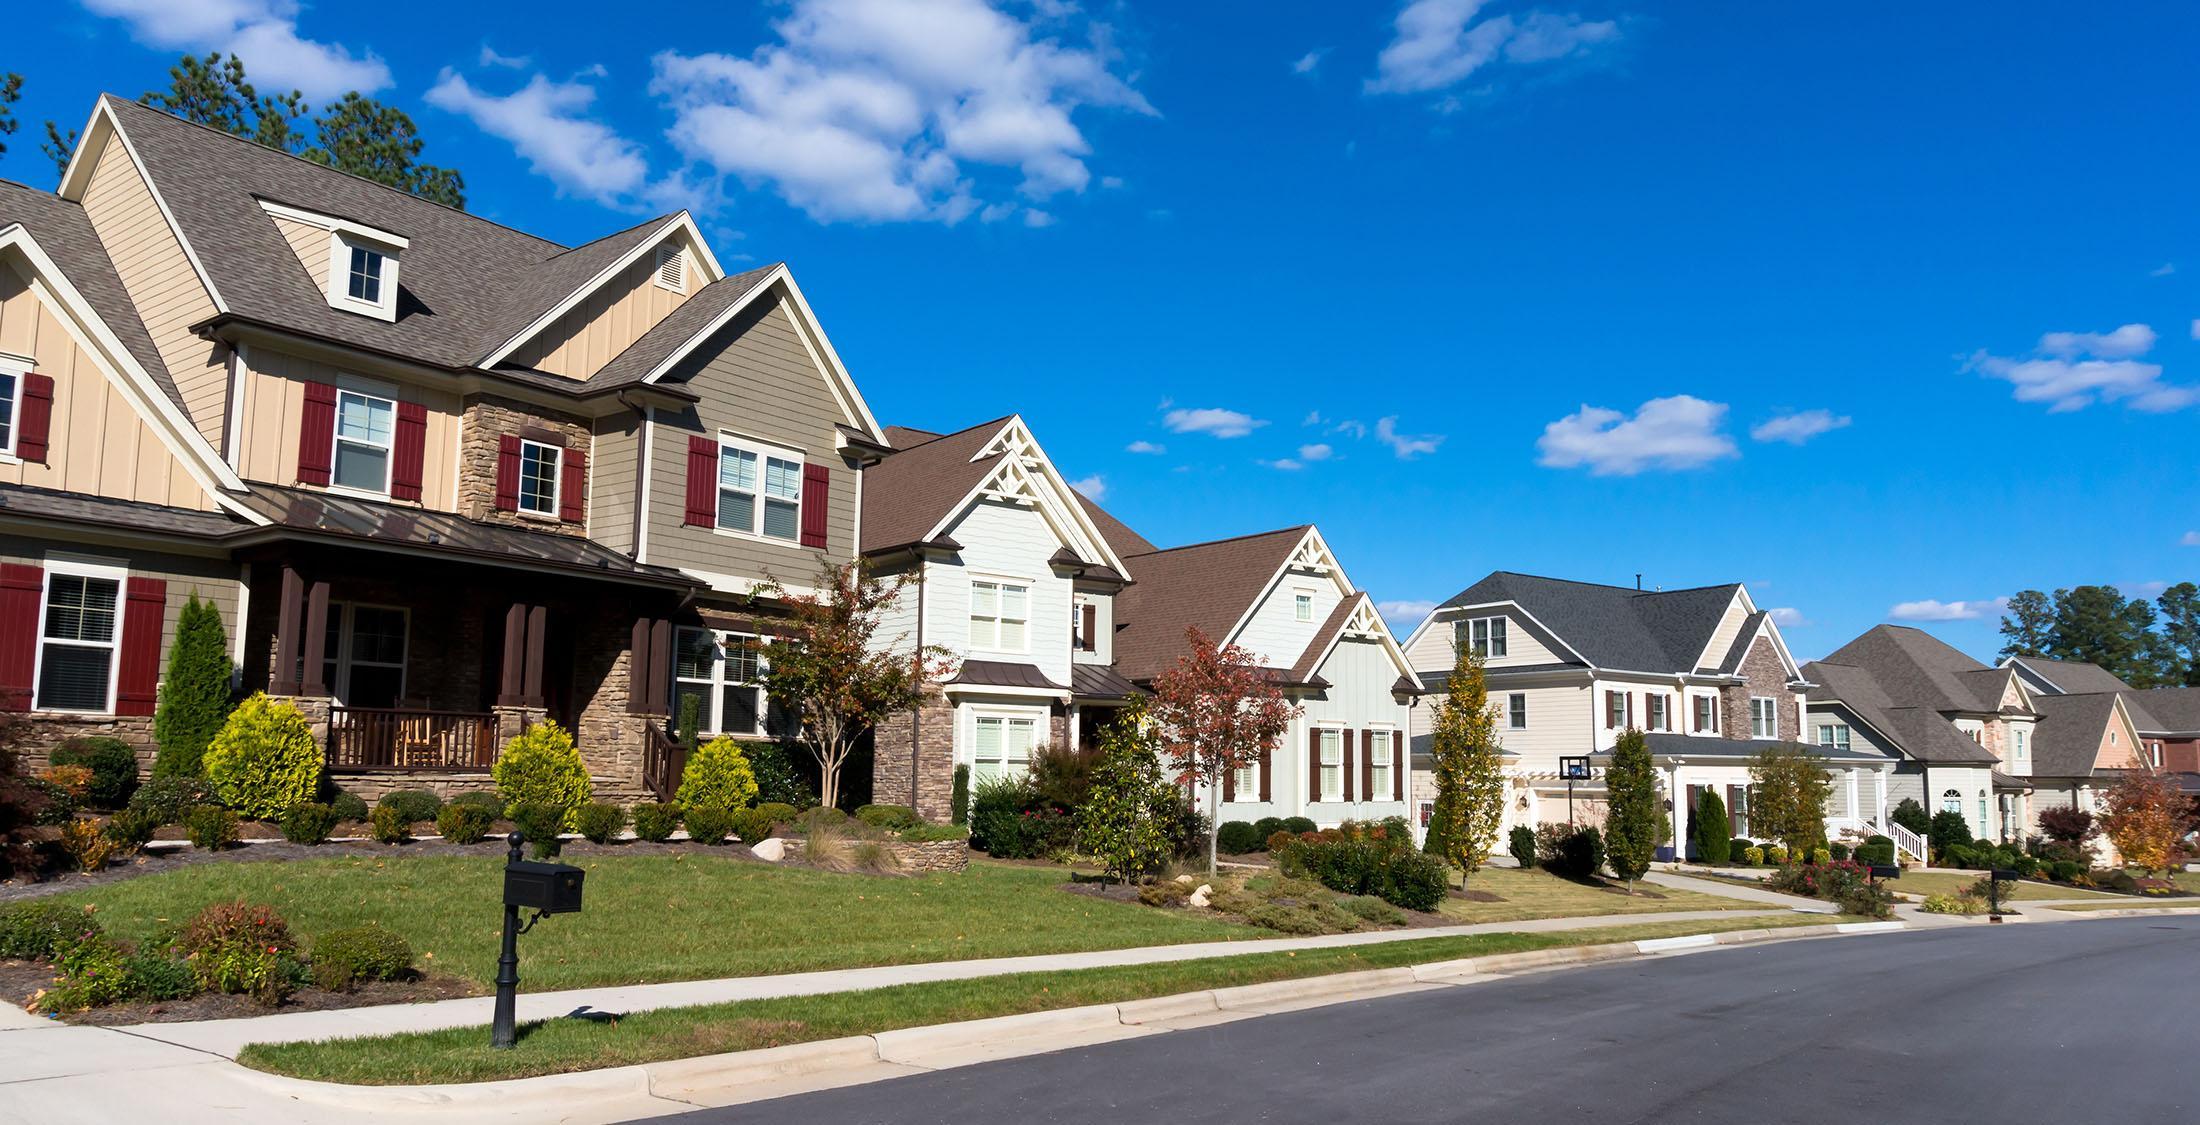 row of suburban houses